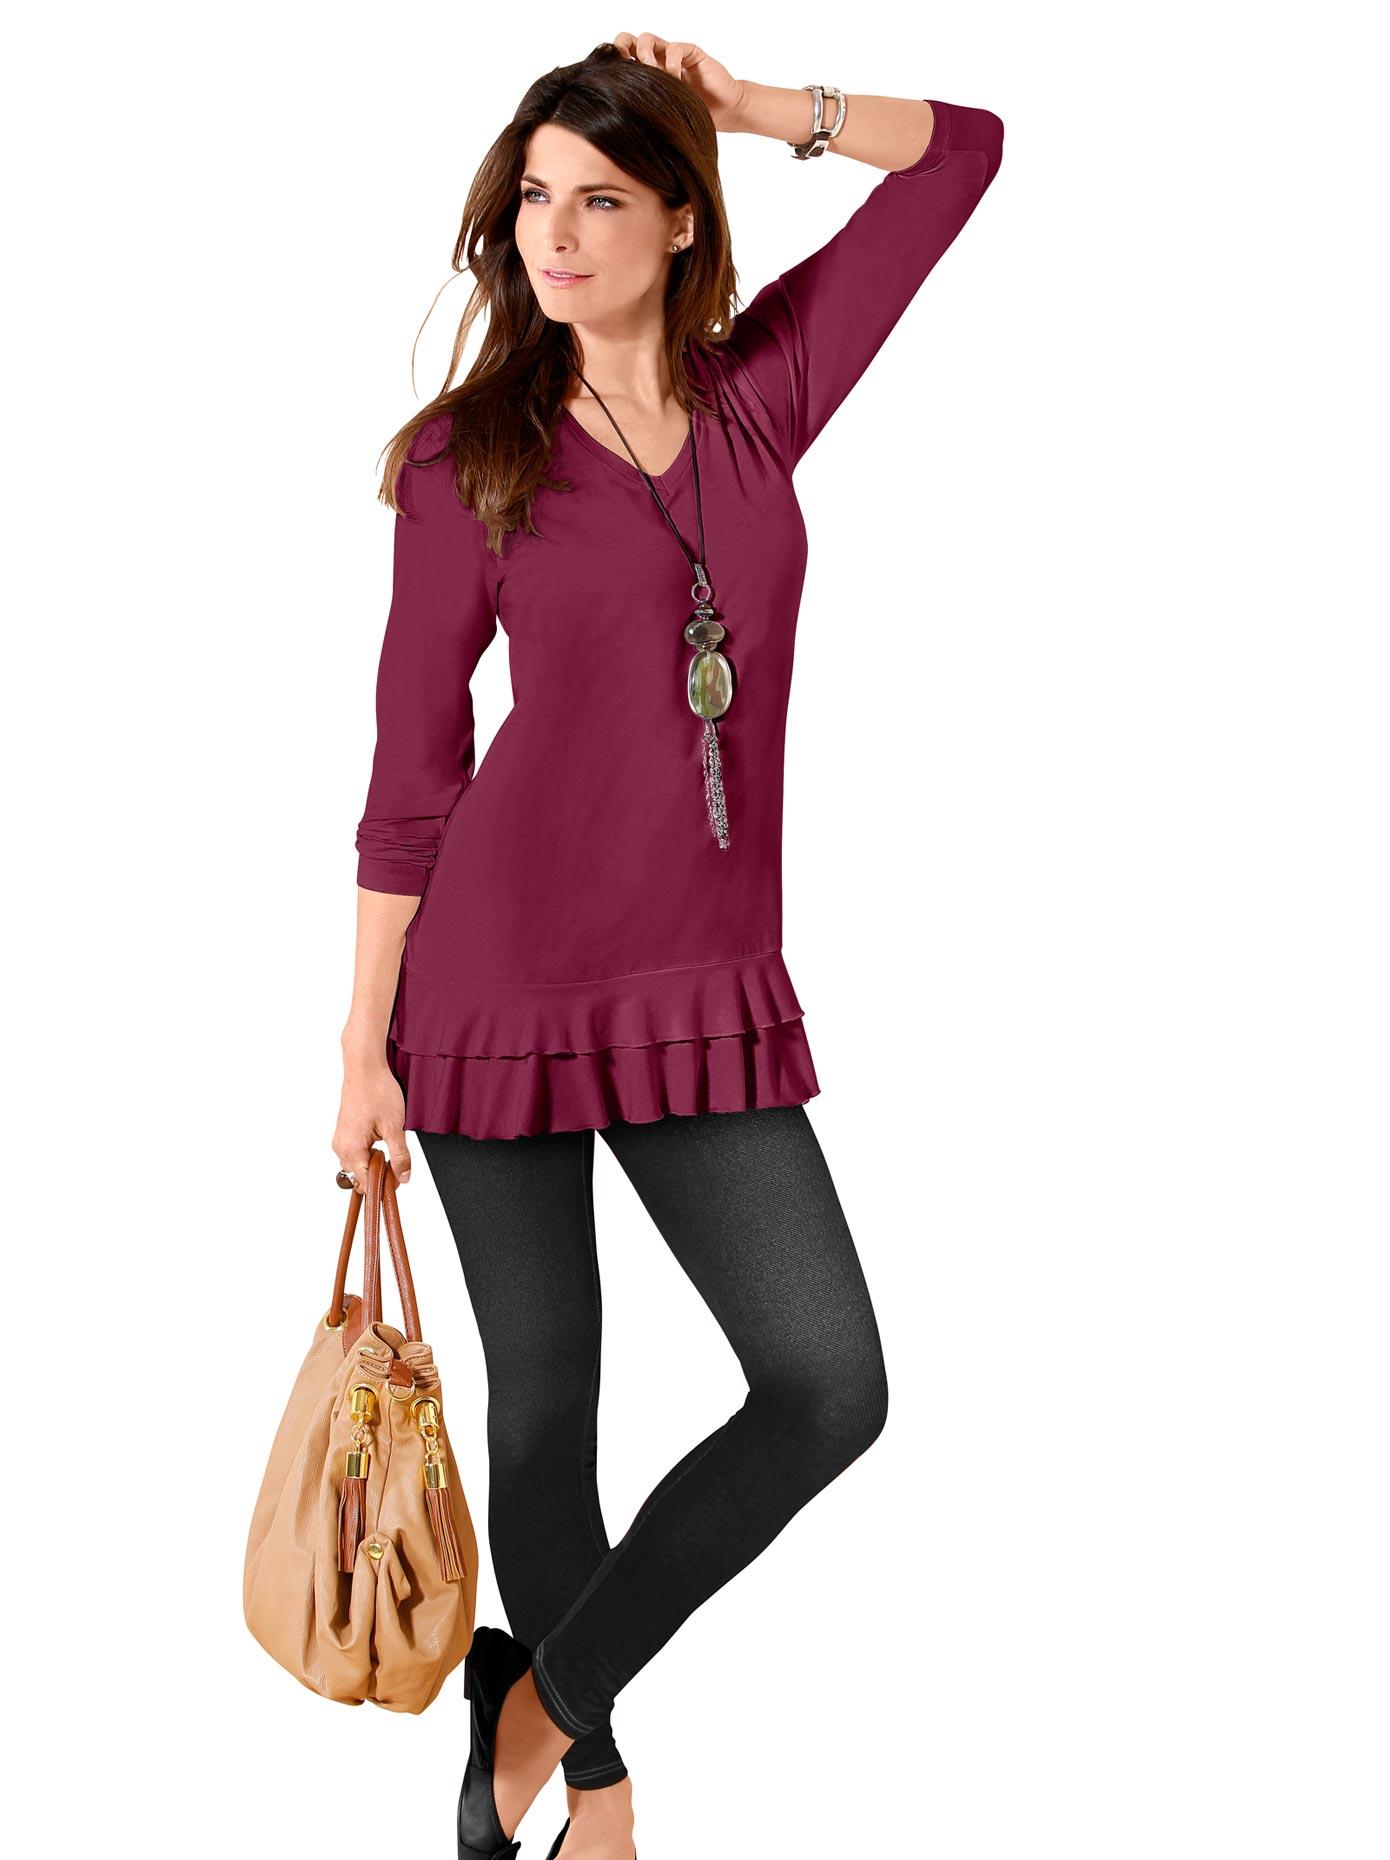 Classic Basics Longshirt   Bekleidung > Shirts > Longshirts   Classic Basics